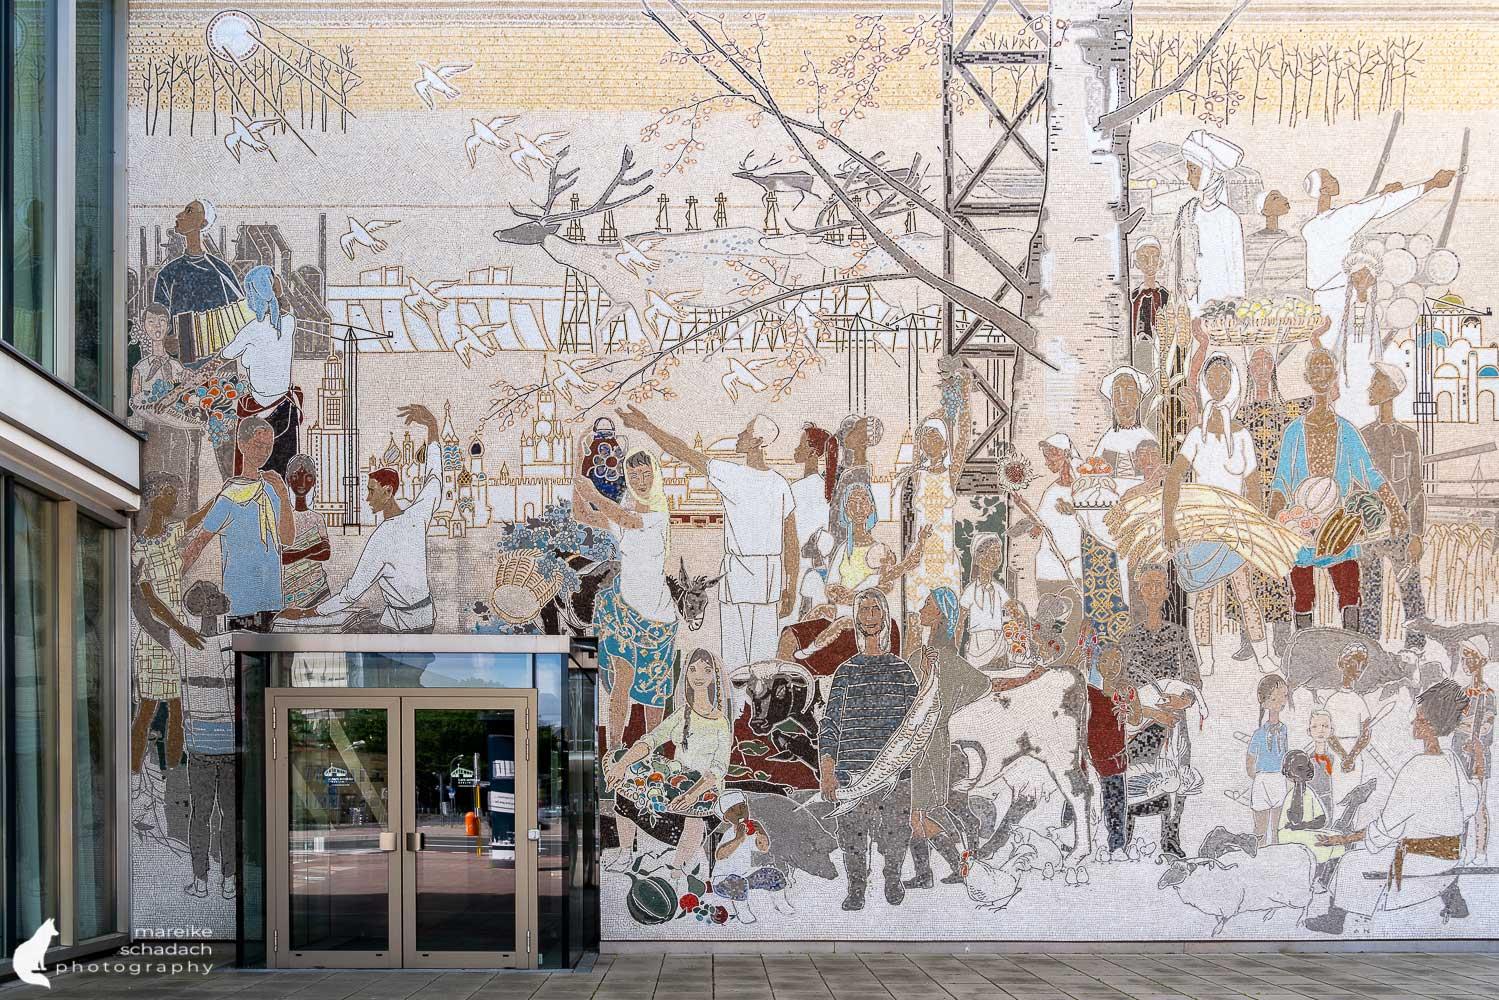 DDR Architektur in Berlin: Mosaik am Cafe Moskau